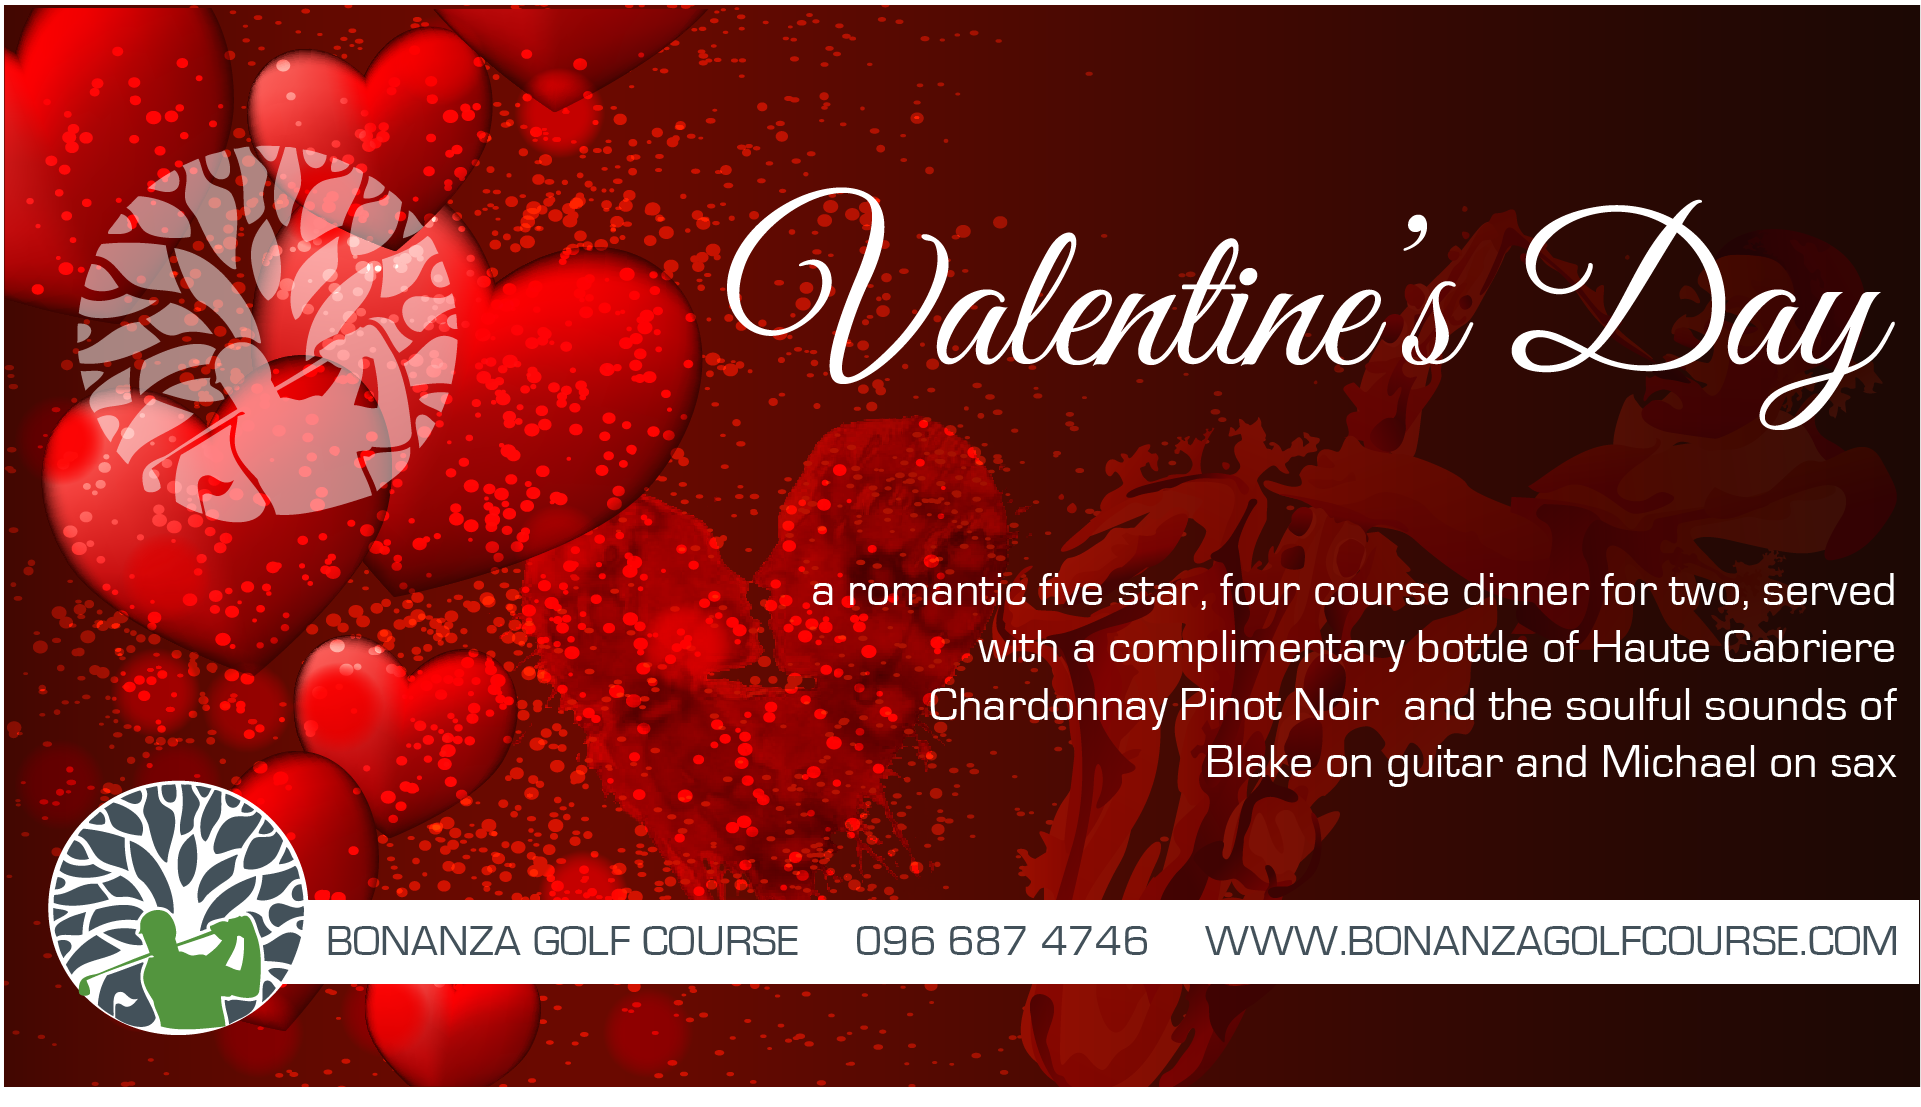 bonanza golf course, zambia, lusaka, valentines day, dinner